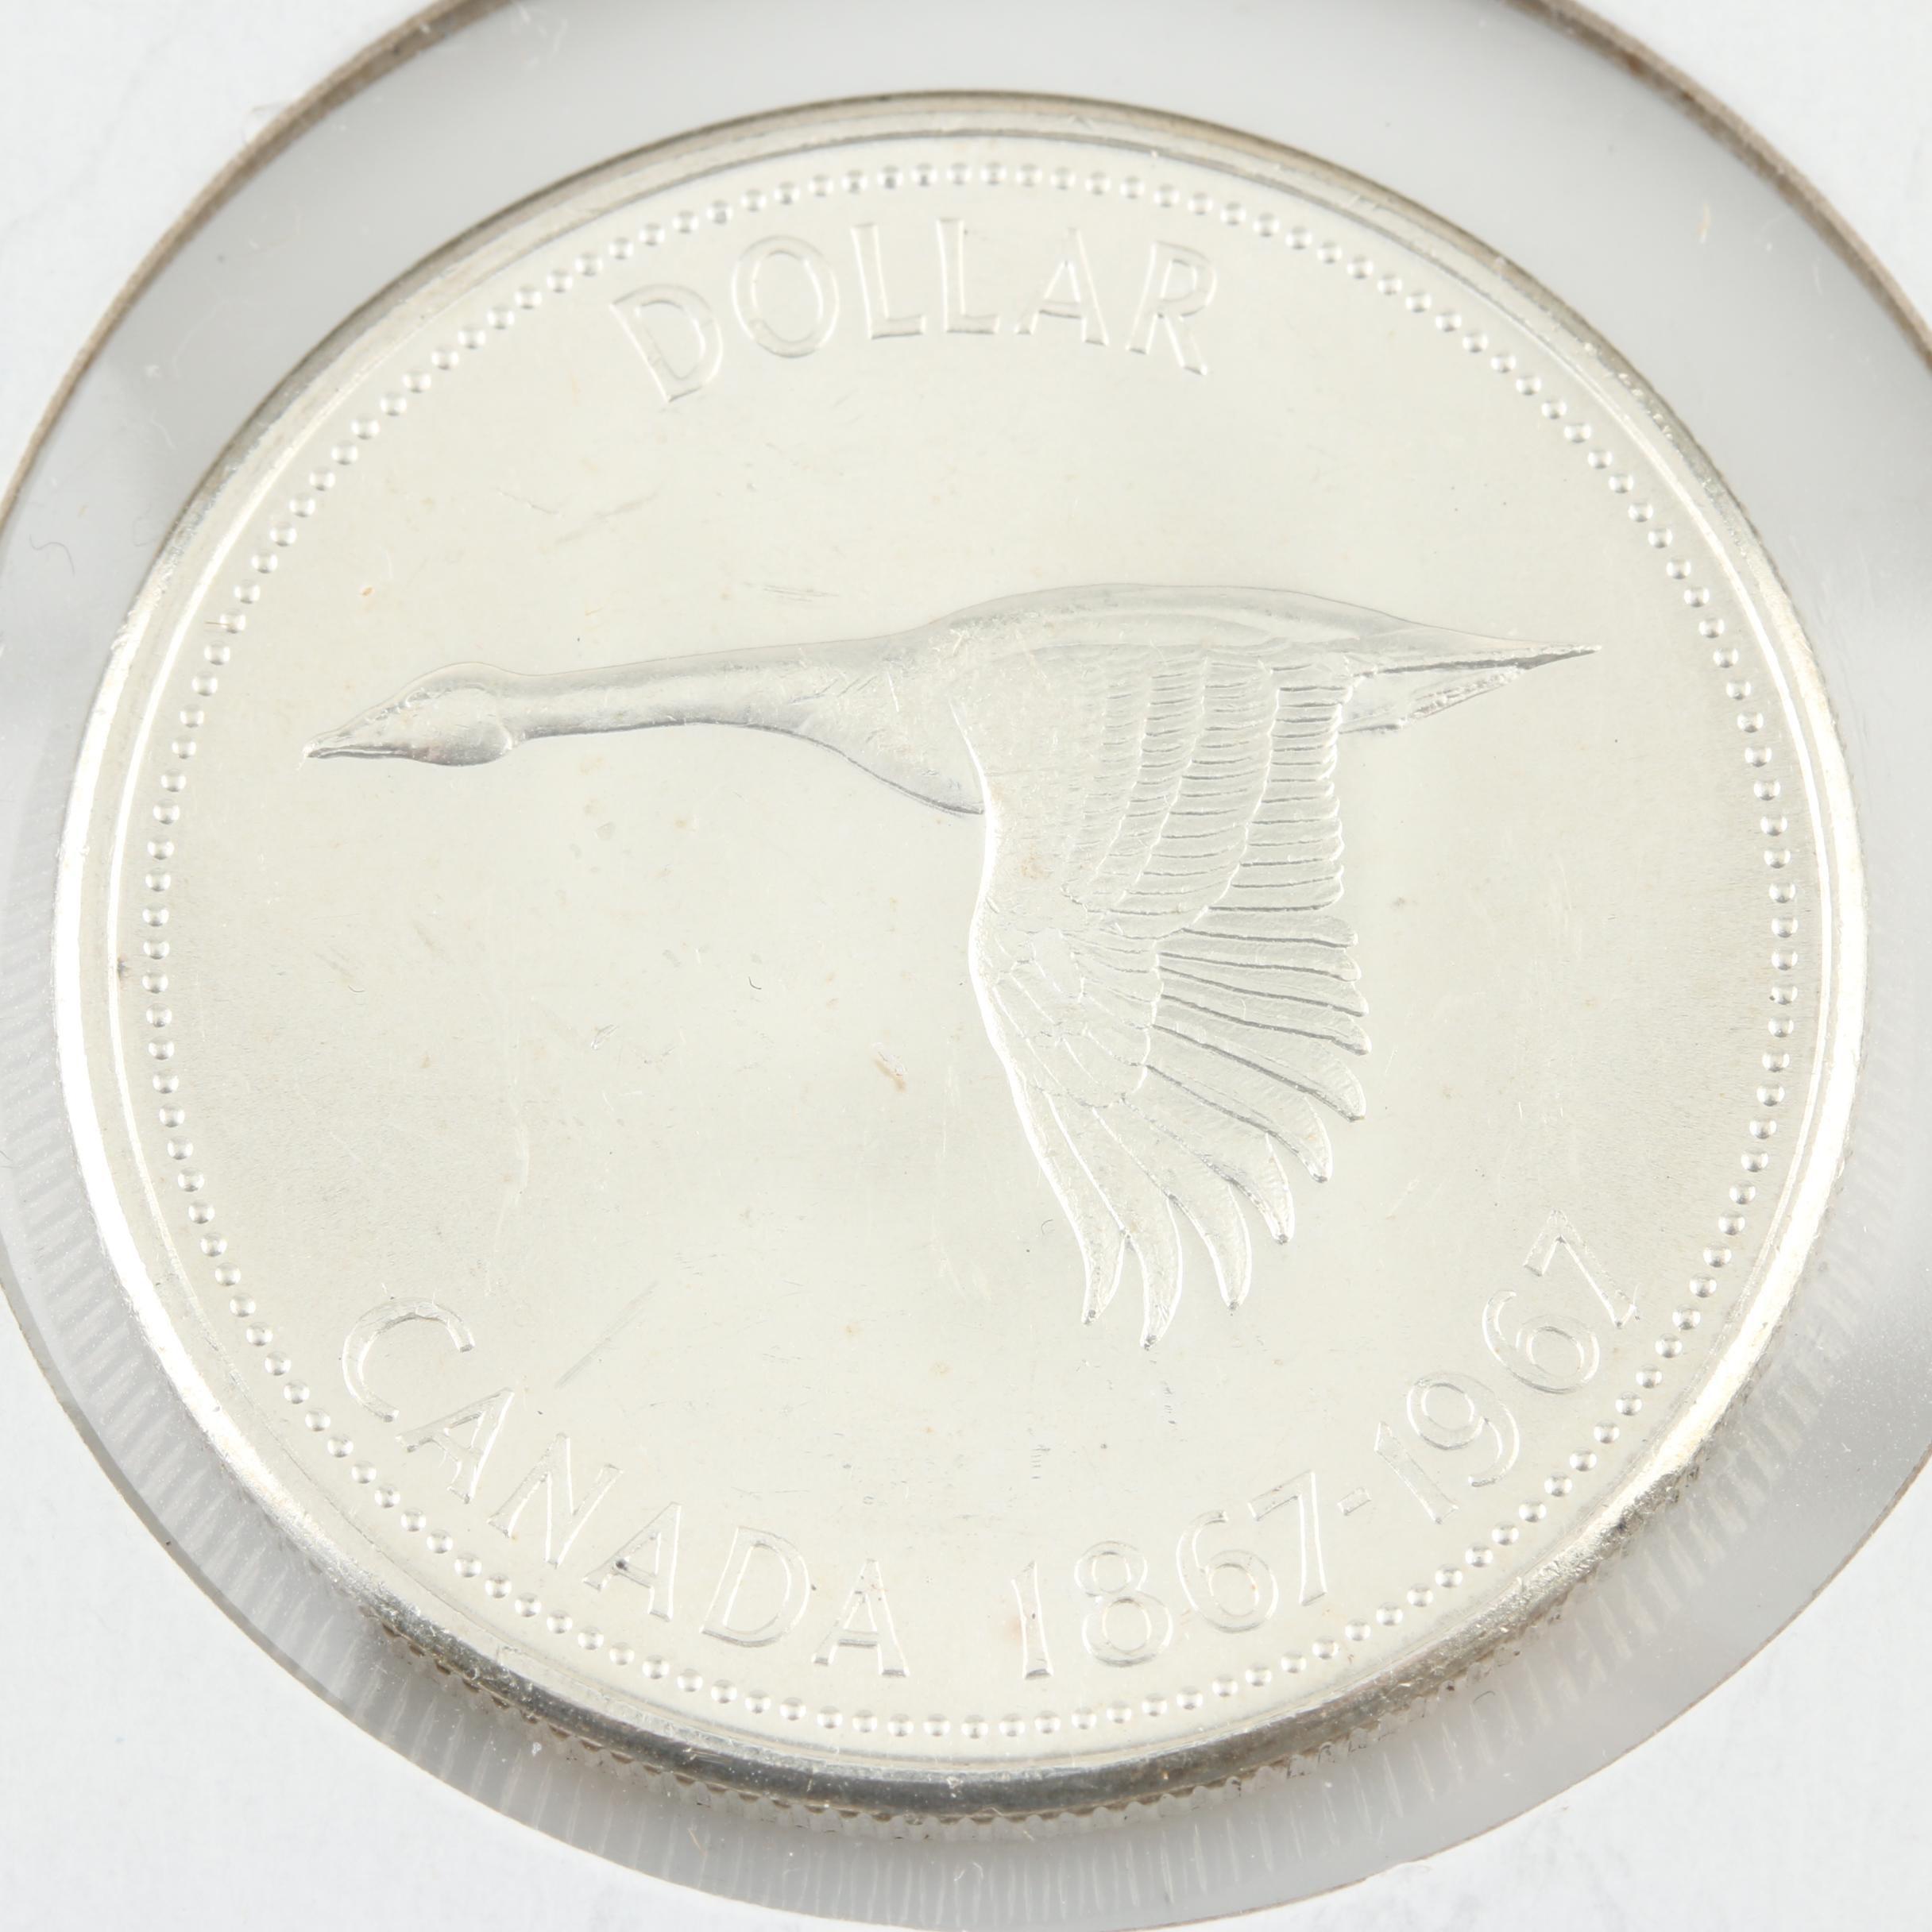 1967 Canadian Silver Dollar (100 Year commemorative)